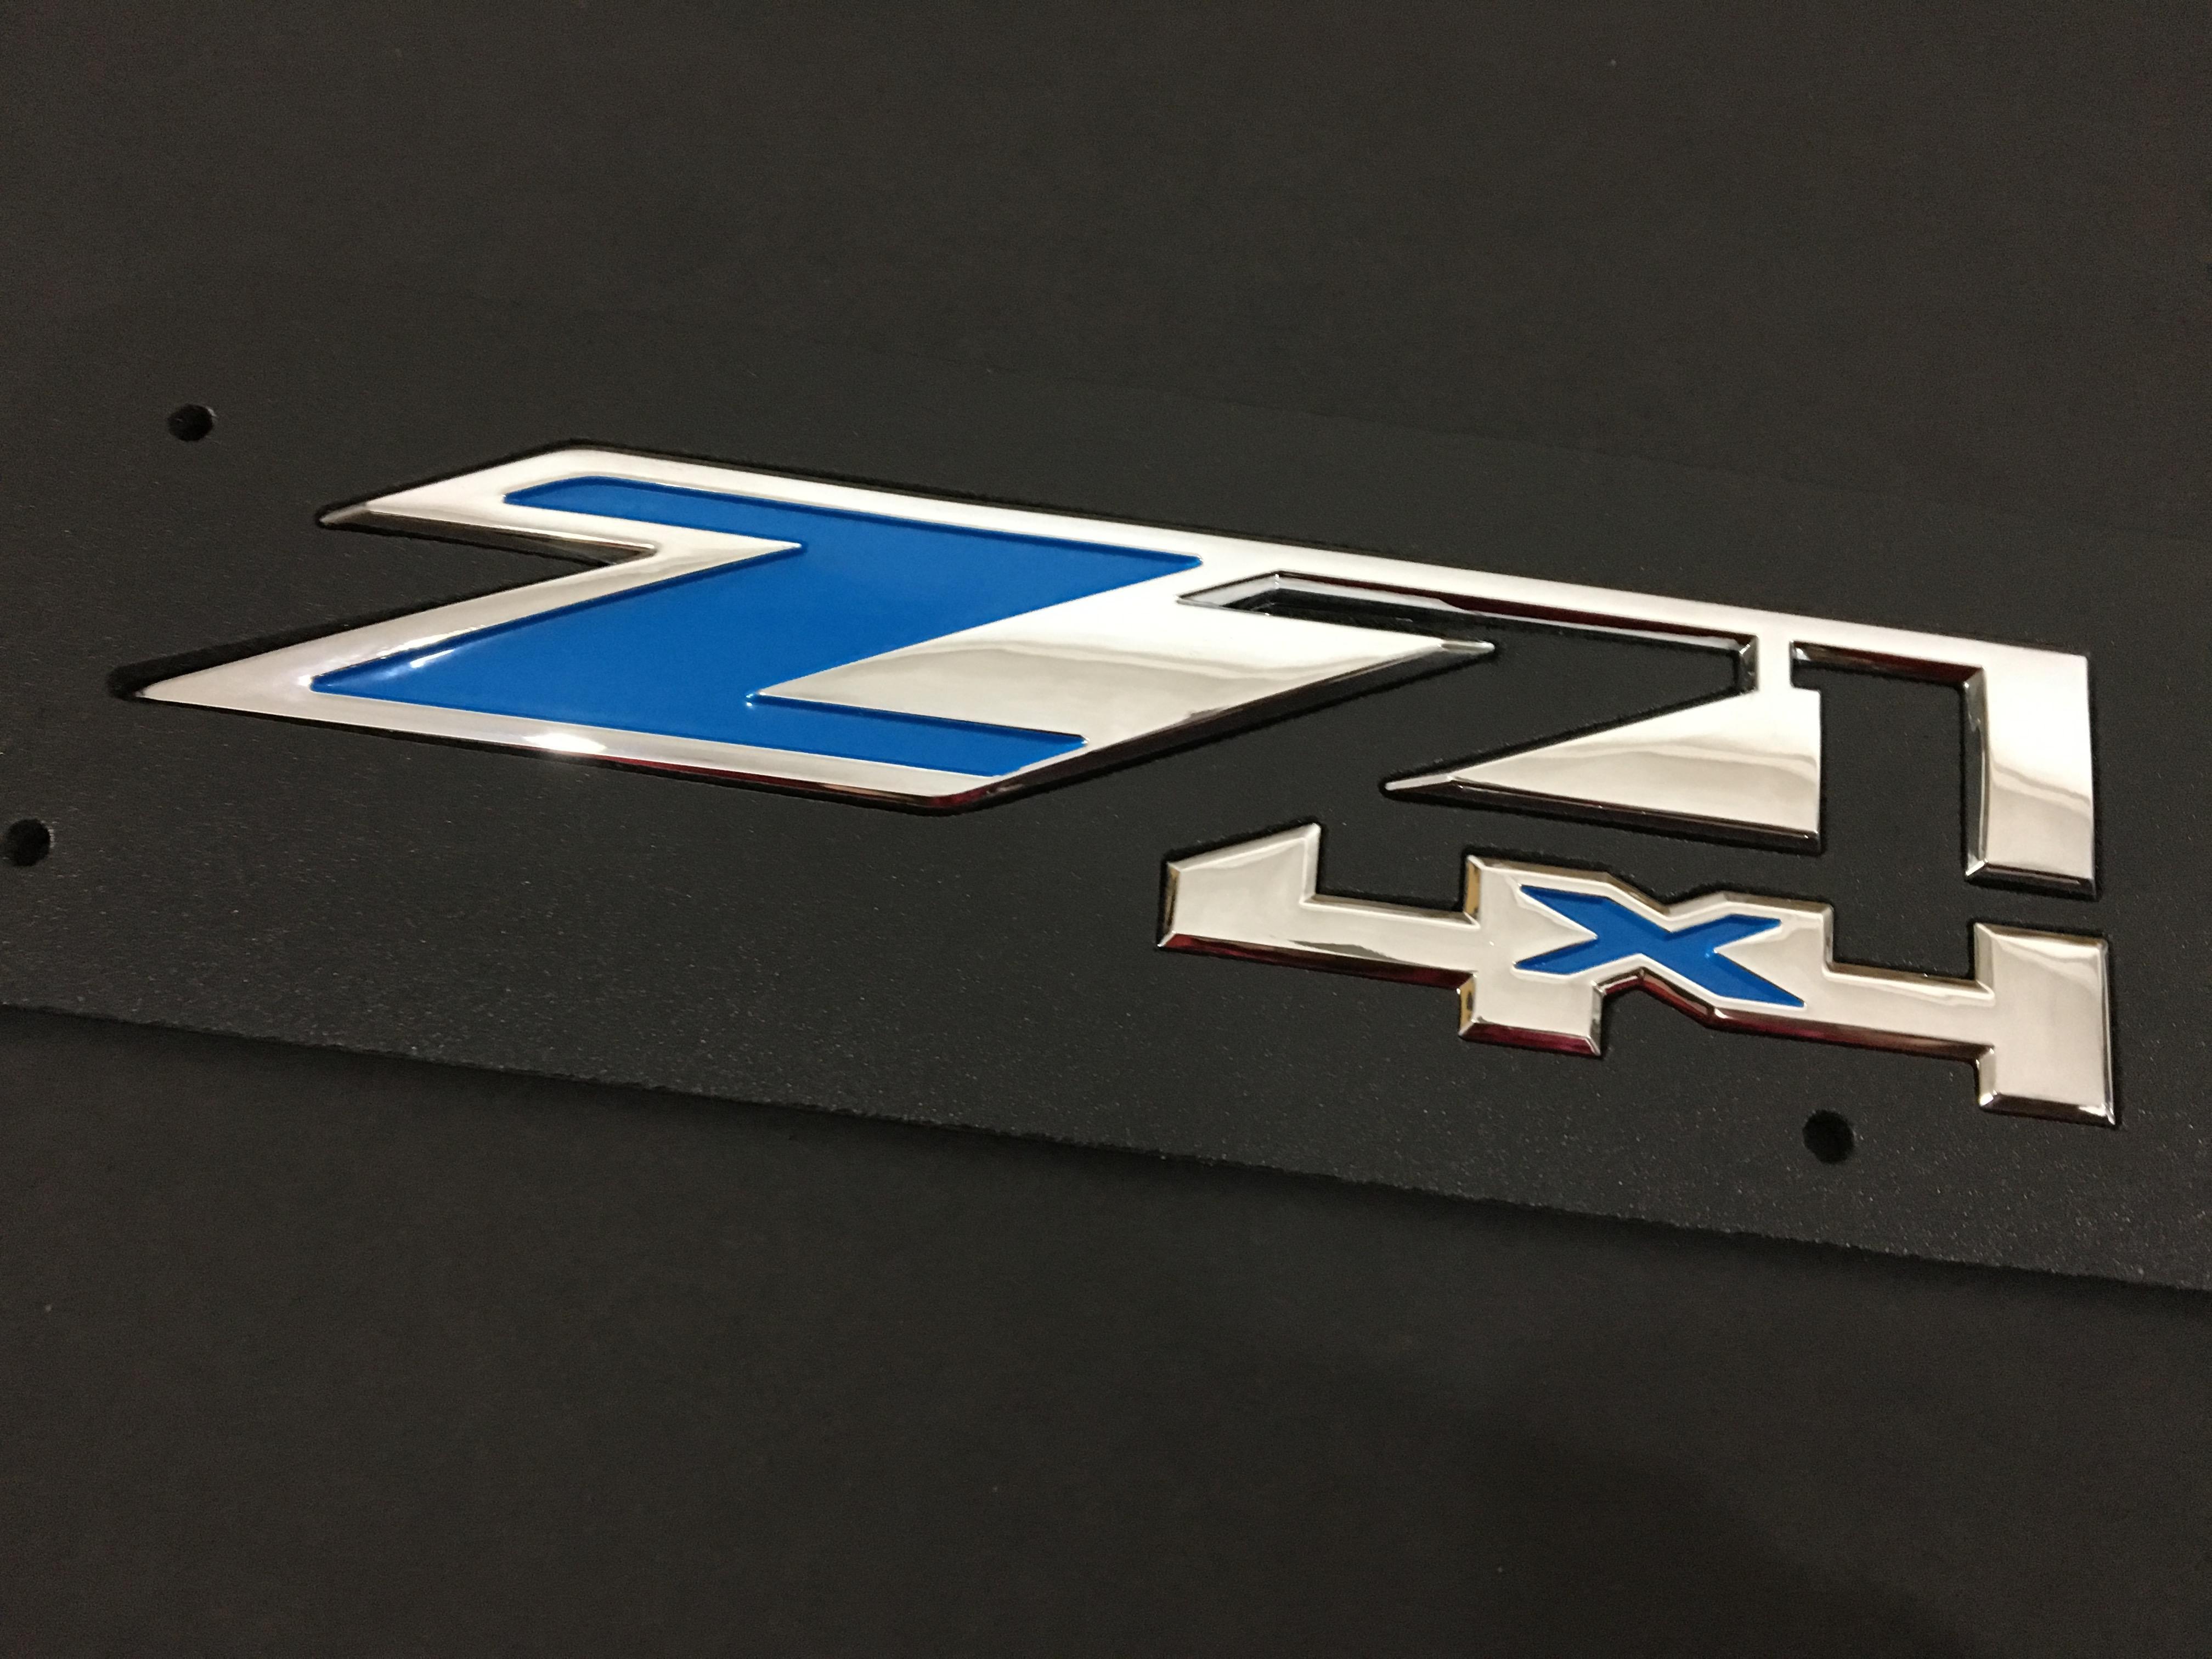 Big Z71 4x4 شعار ABS شارة ل شيفي سيلفرادو سييرا سبعبربان سيارة الذيل بوابة بوابة